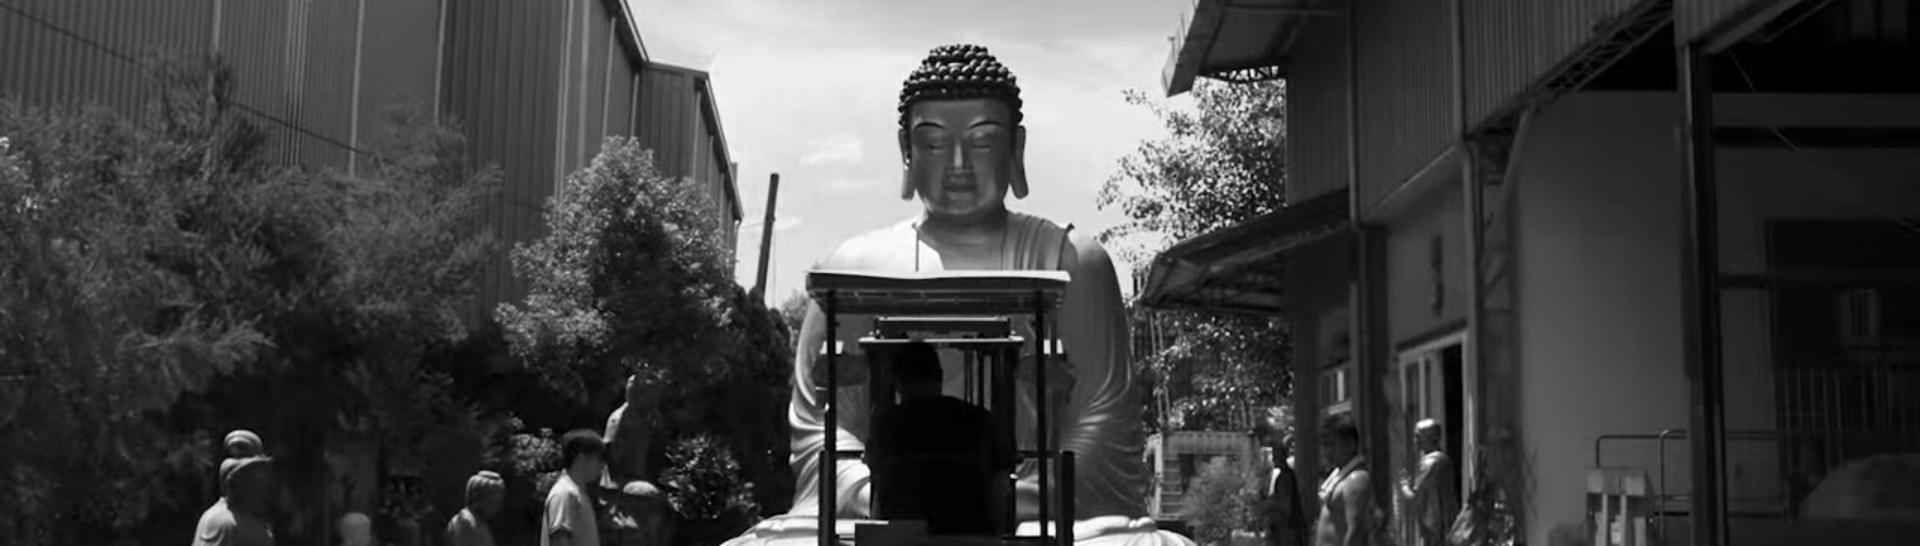 The Great Buddha+. Image Credit: MandarinVision